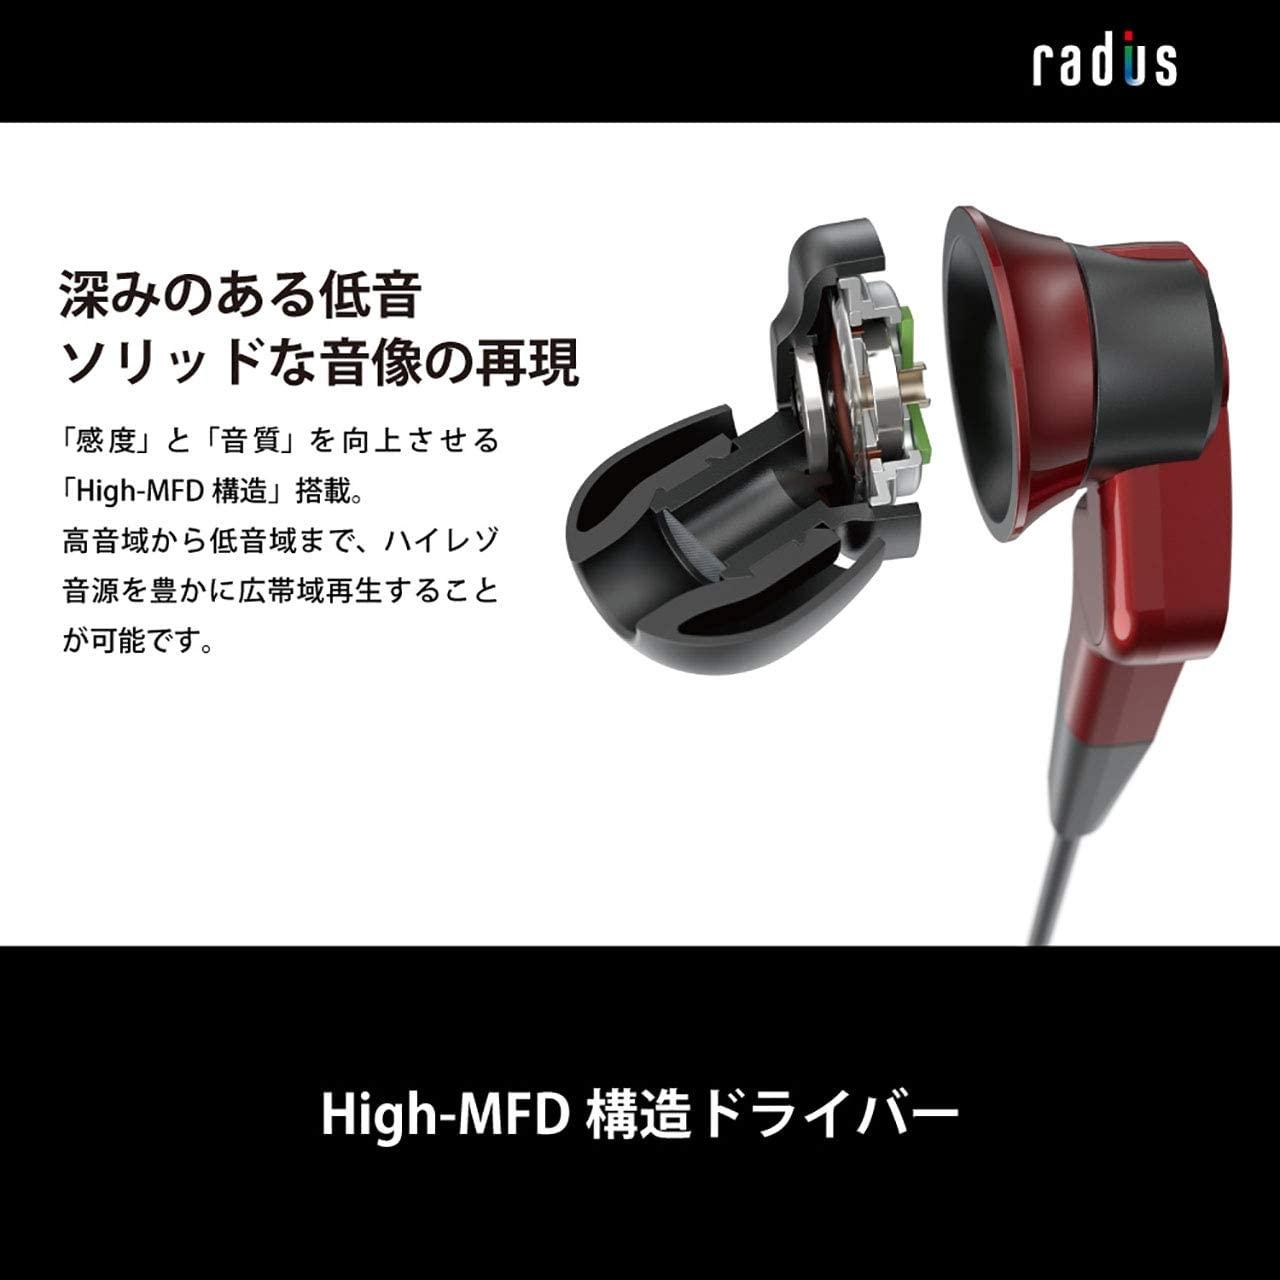 HP-NHR21 High-MFD搭載 重低音ハイレゾイヤホン 上位モデル